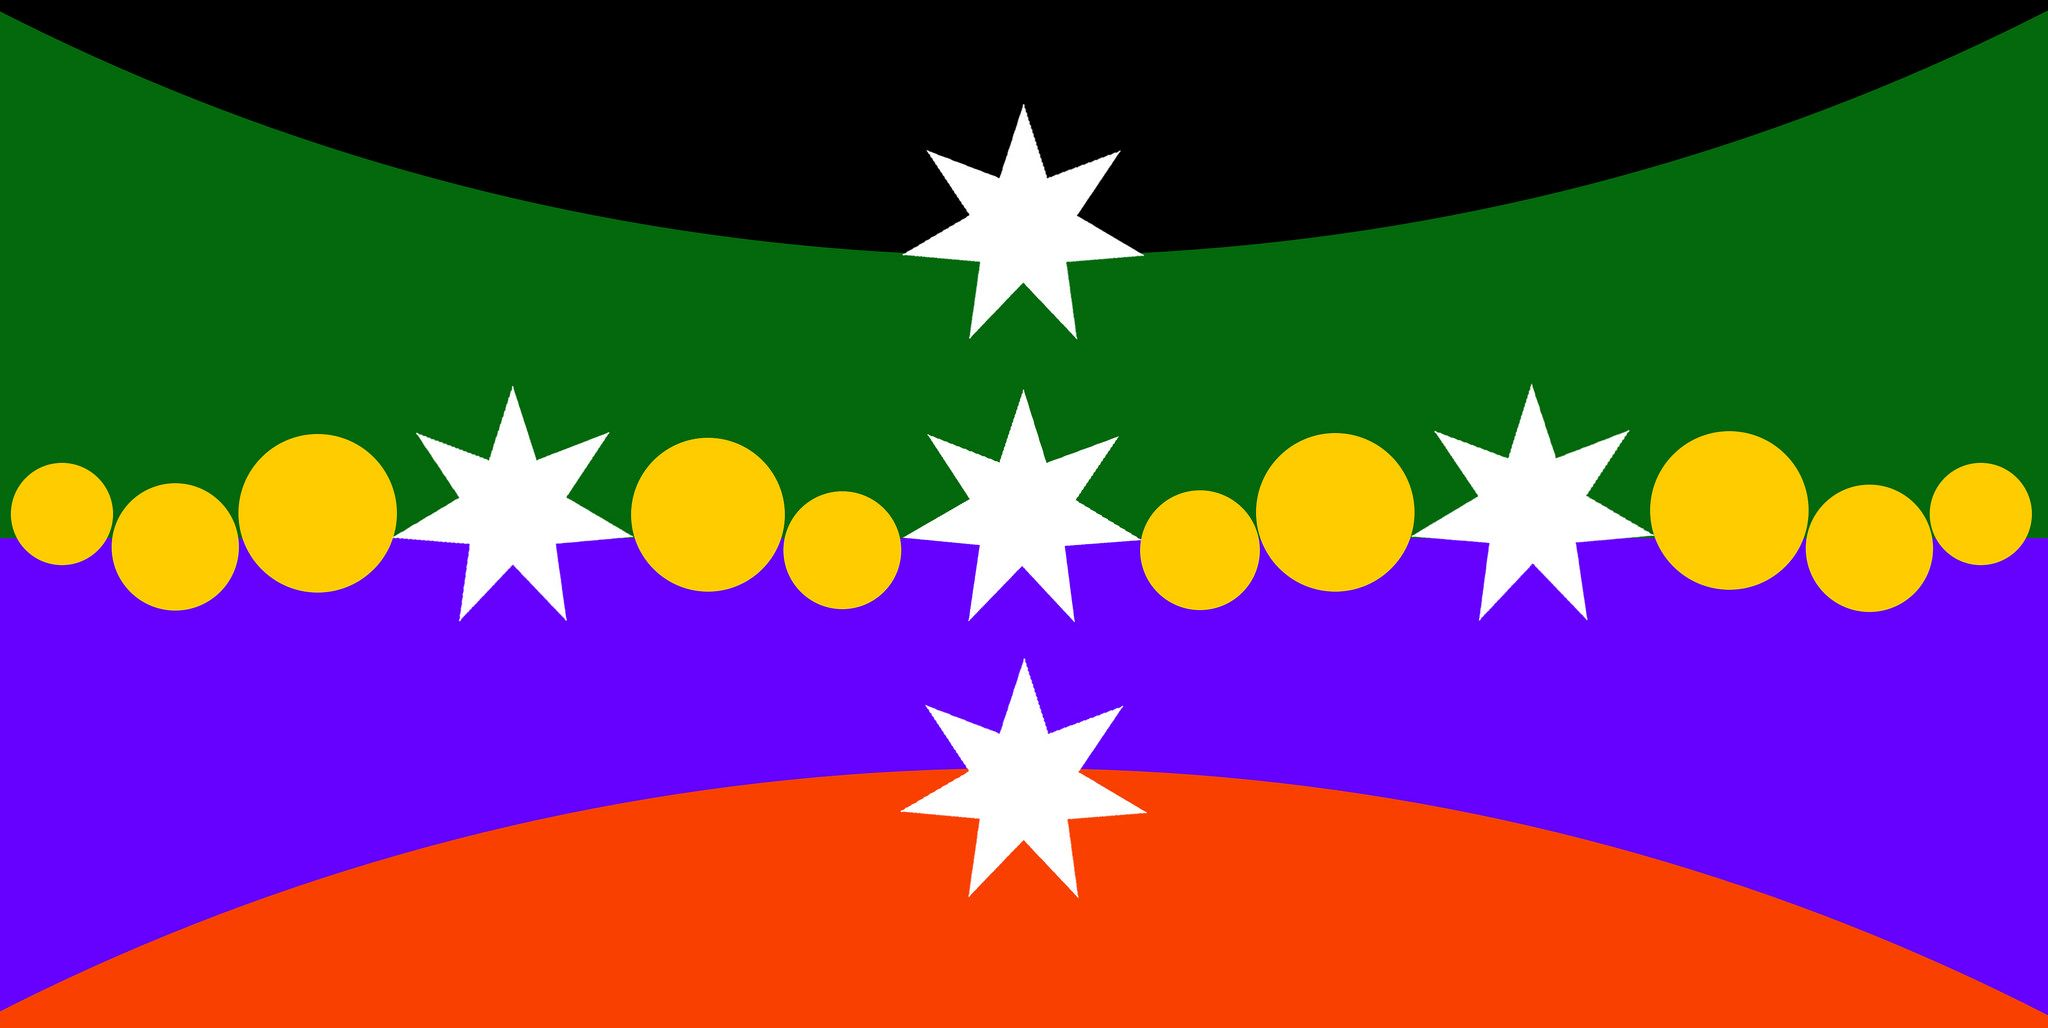 Uluru Sky Max Green Hblue Australisdot Banderas